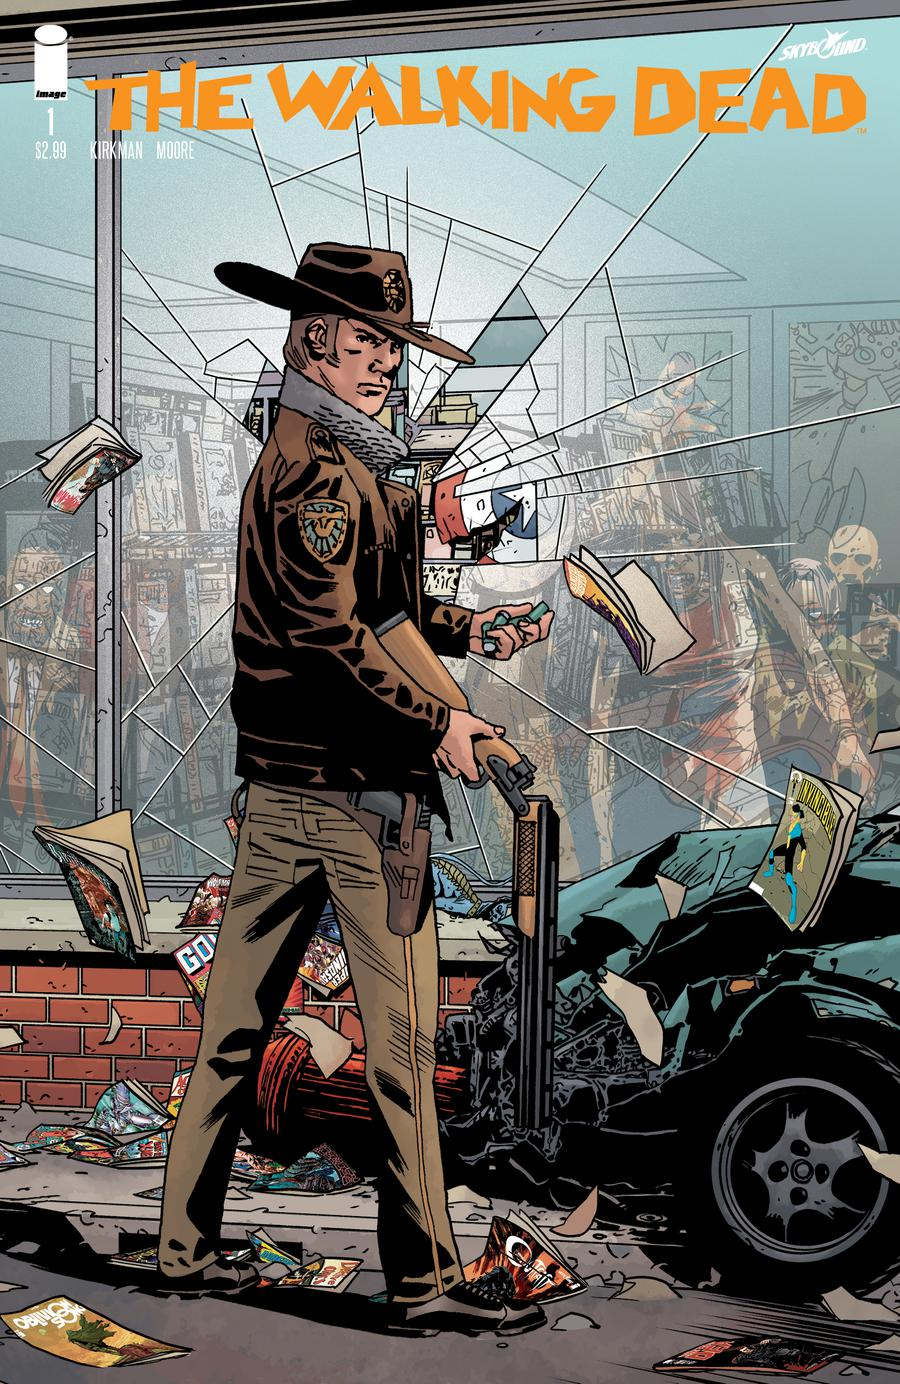 Walking Dead 15th Anniversary Edition #1 Regular Cover